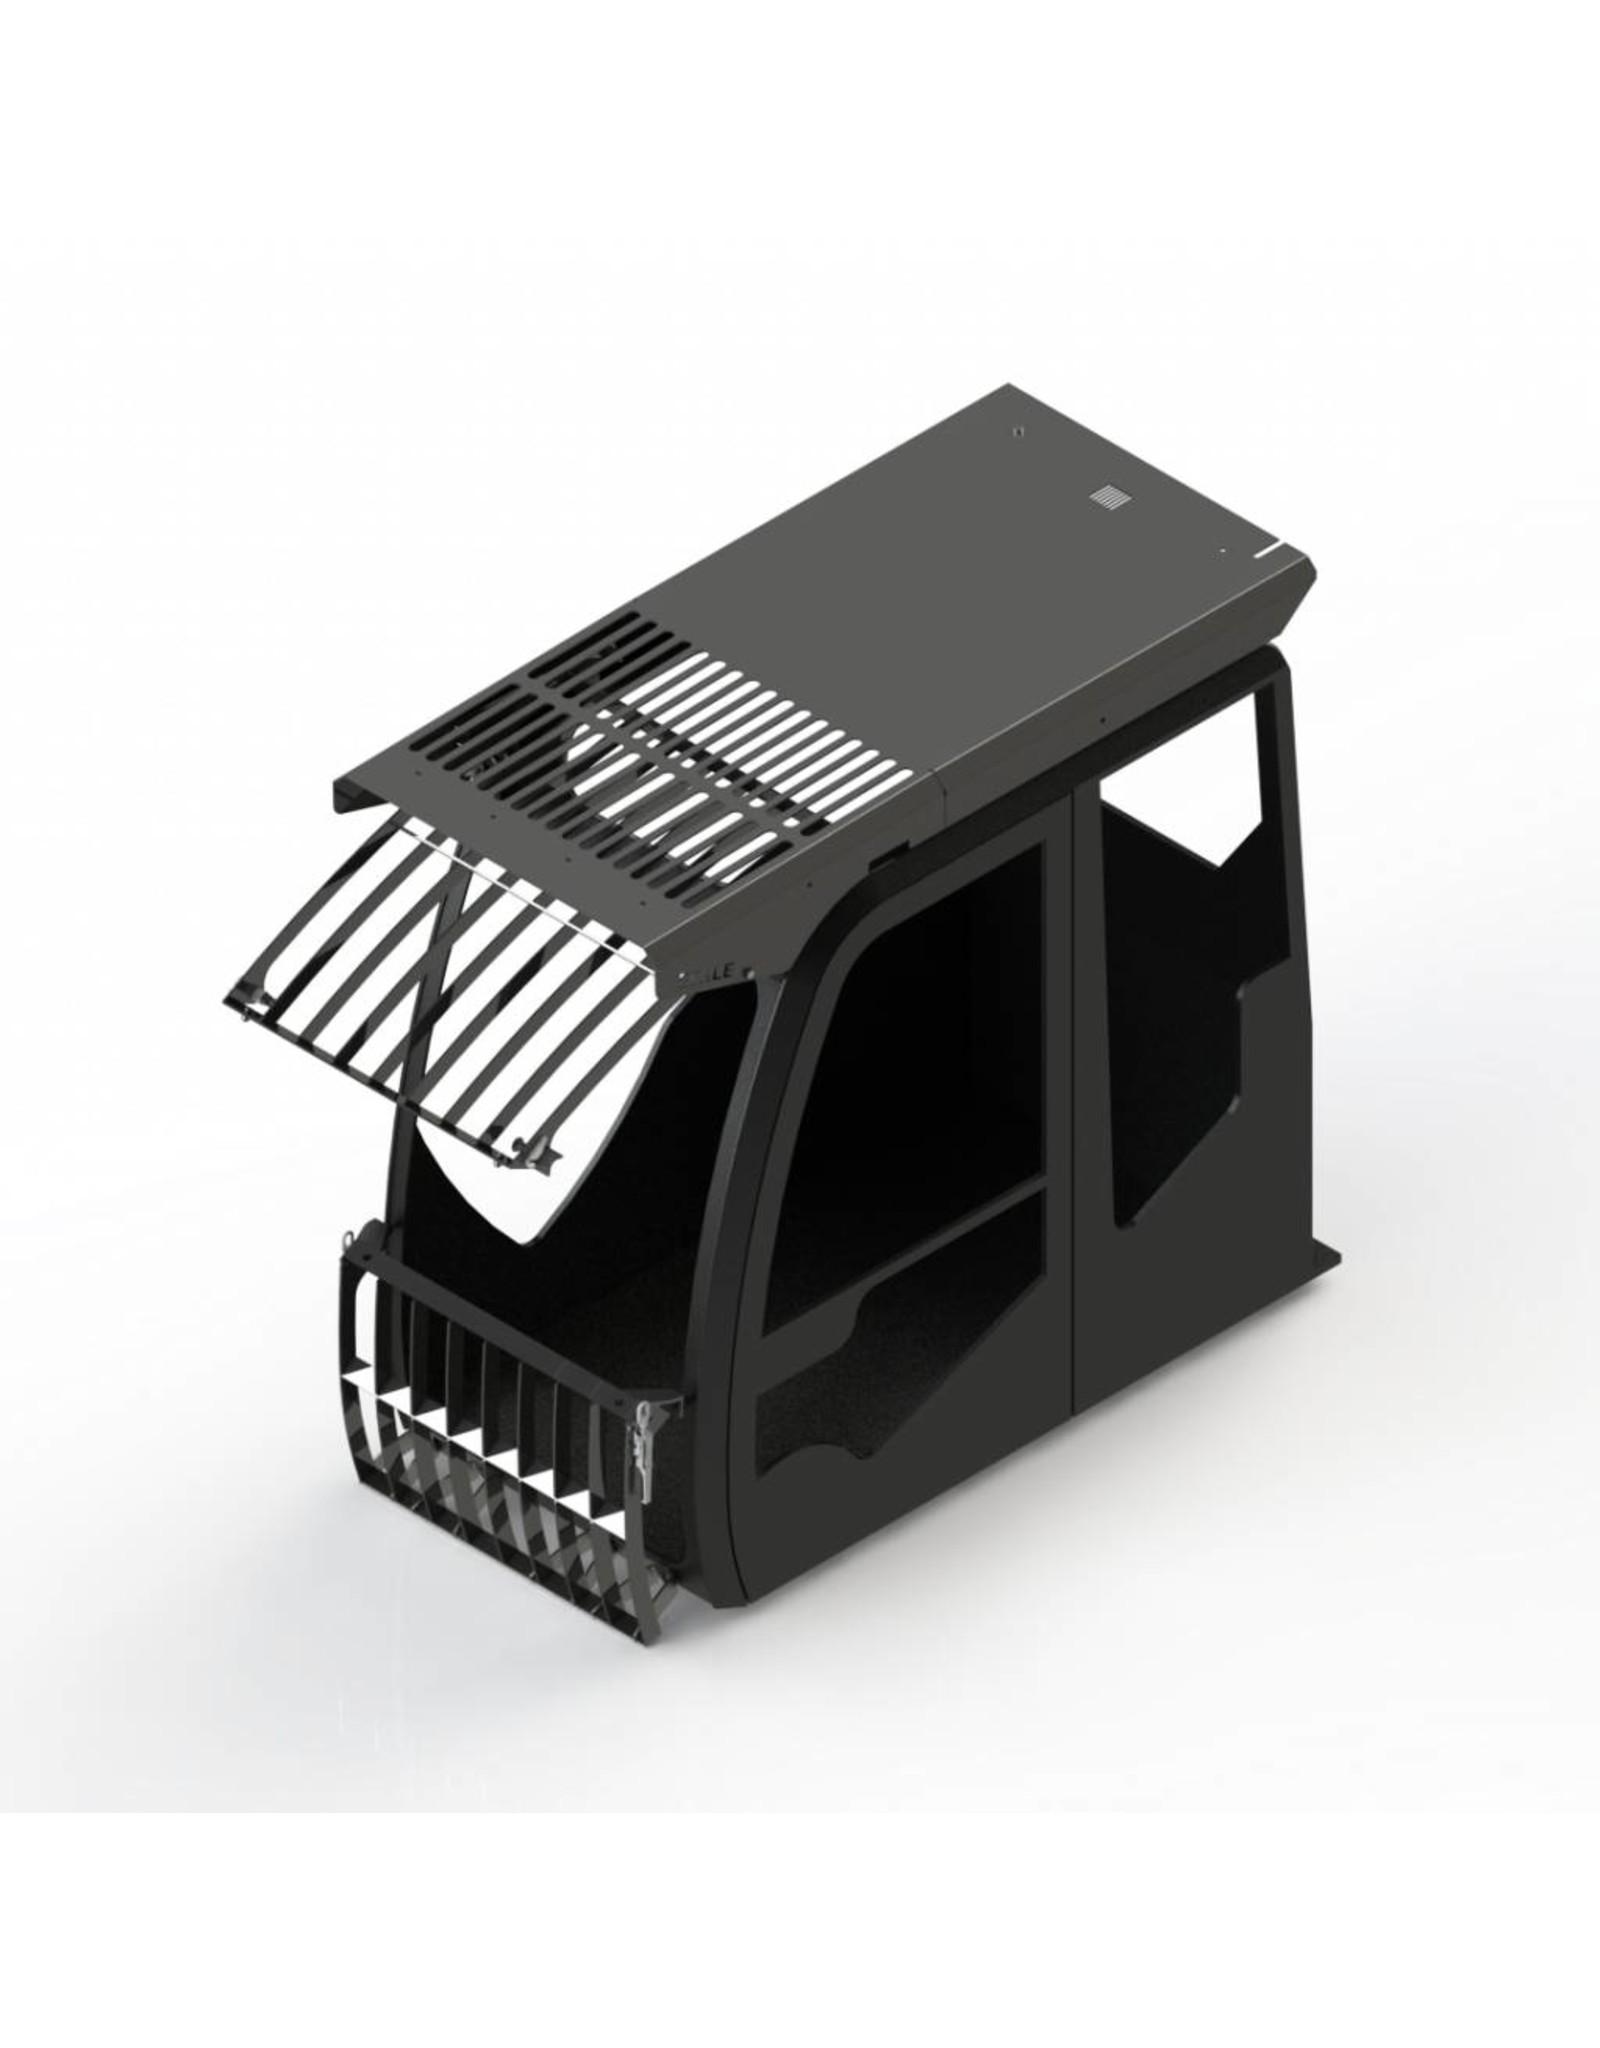 Echle Hartstahl GmbH FOPS for JCB JS220LC